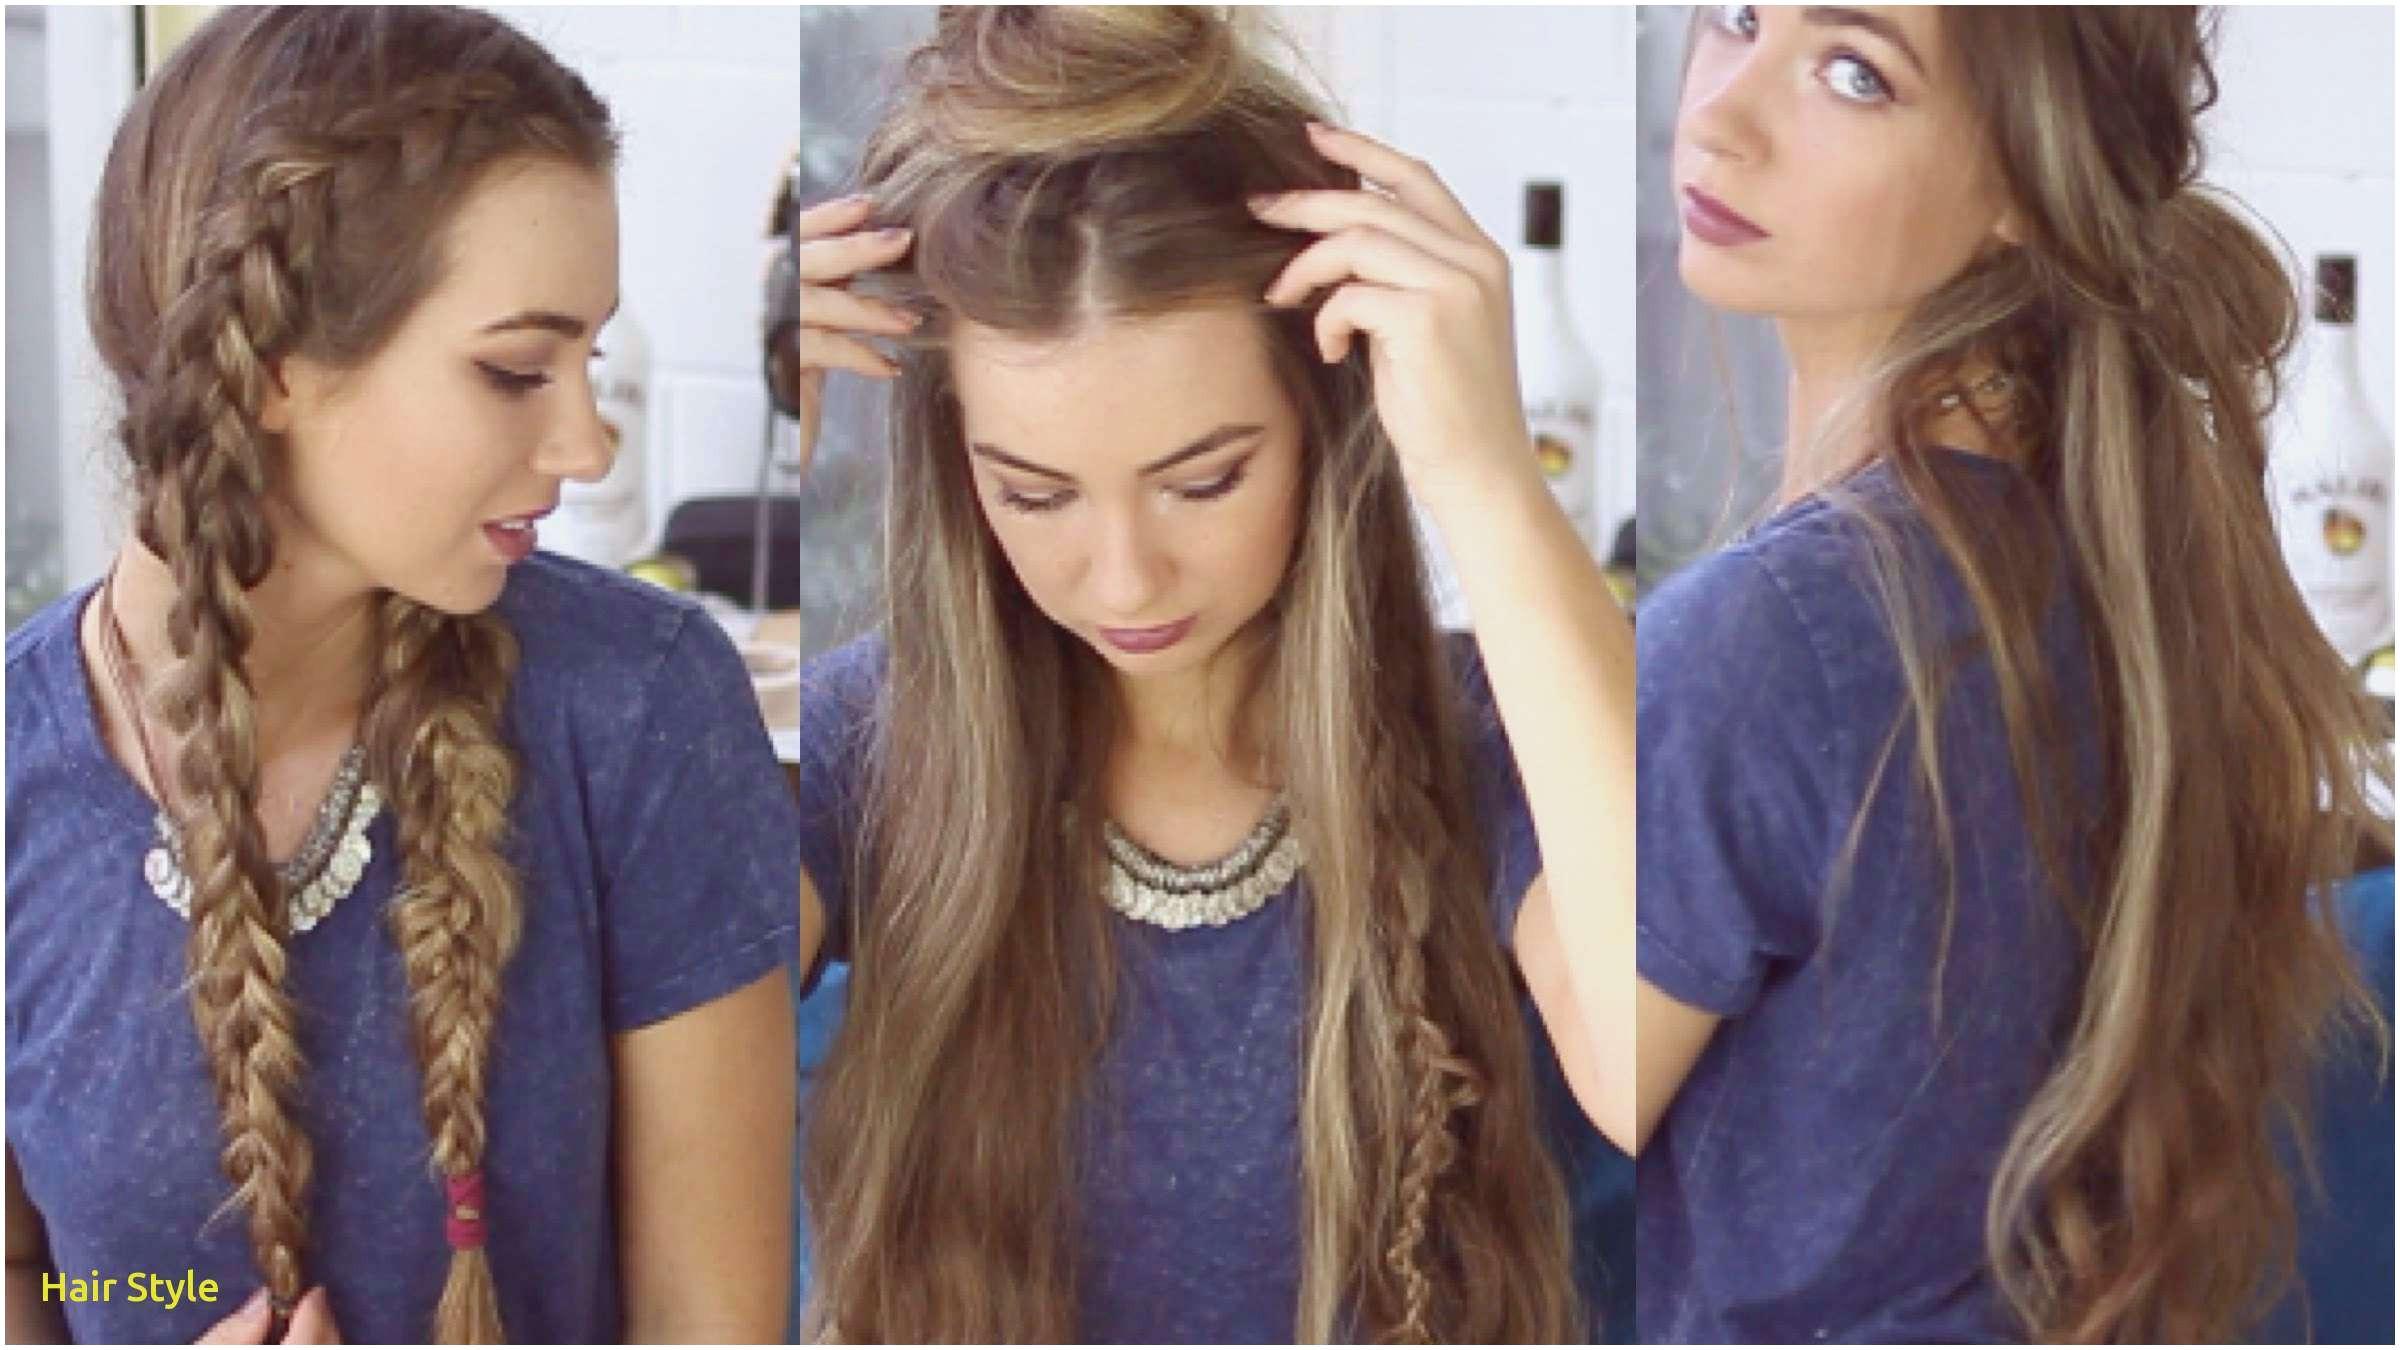 Hairstyle Buns Dailymotion 48 Awesome Bun Hairstyles for Medium Length Hair – Lockyourmedsidaho